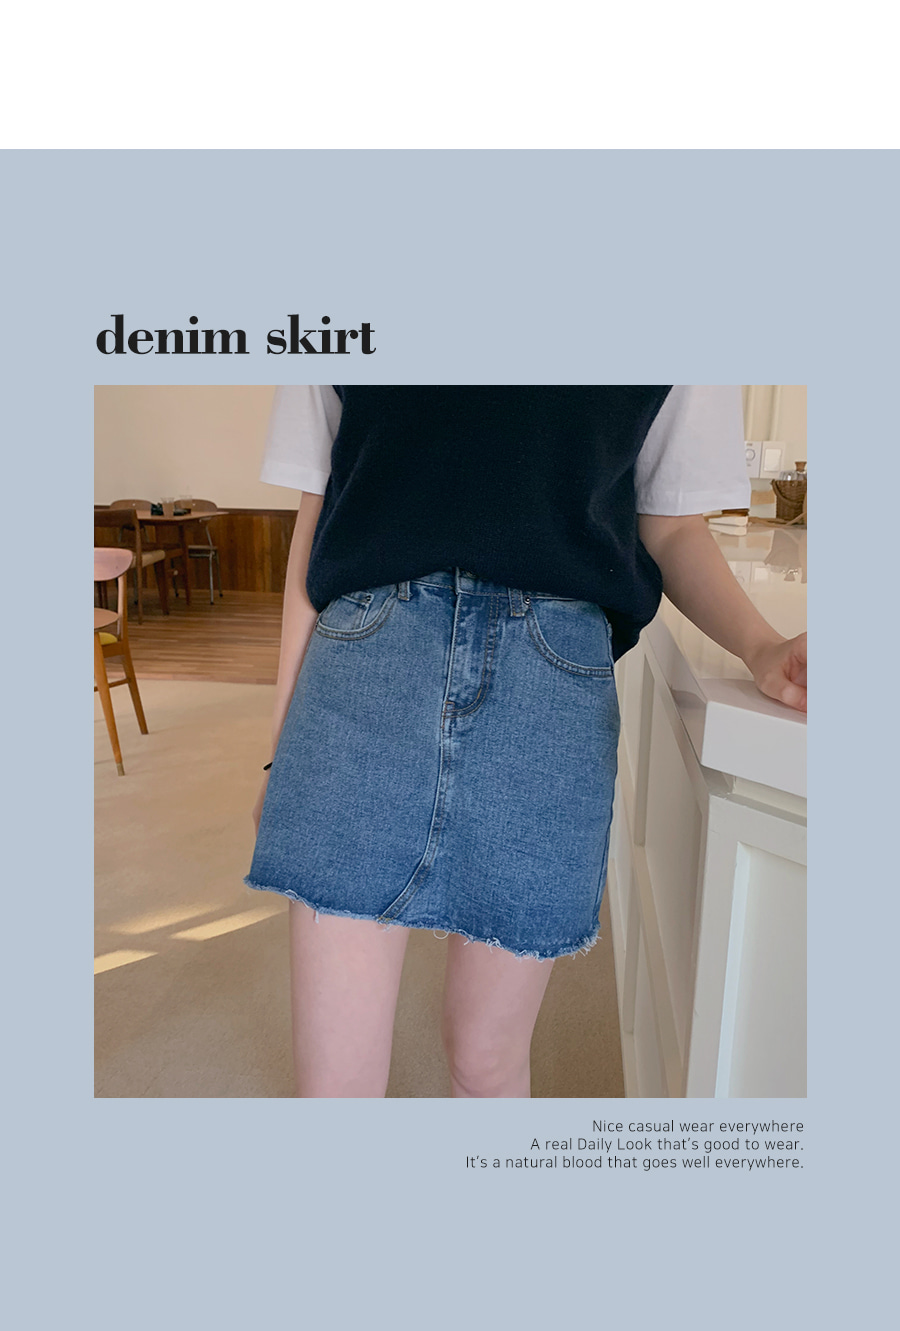 Lady denim skirt